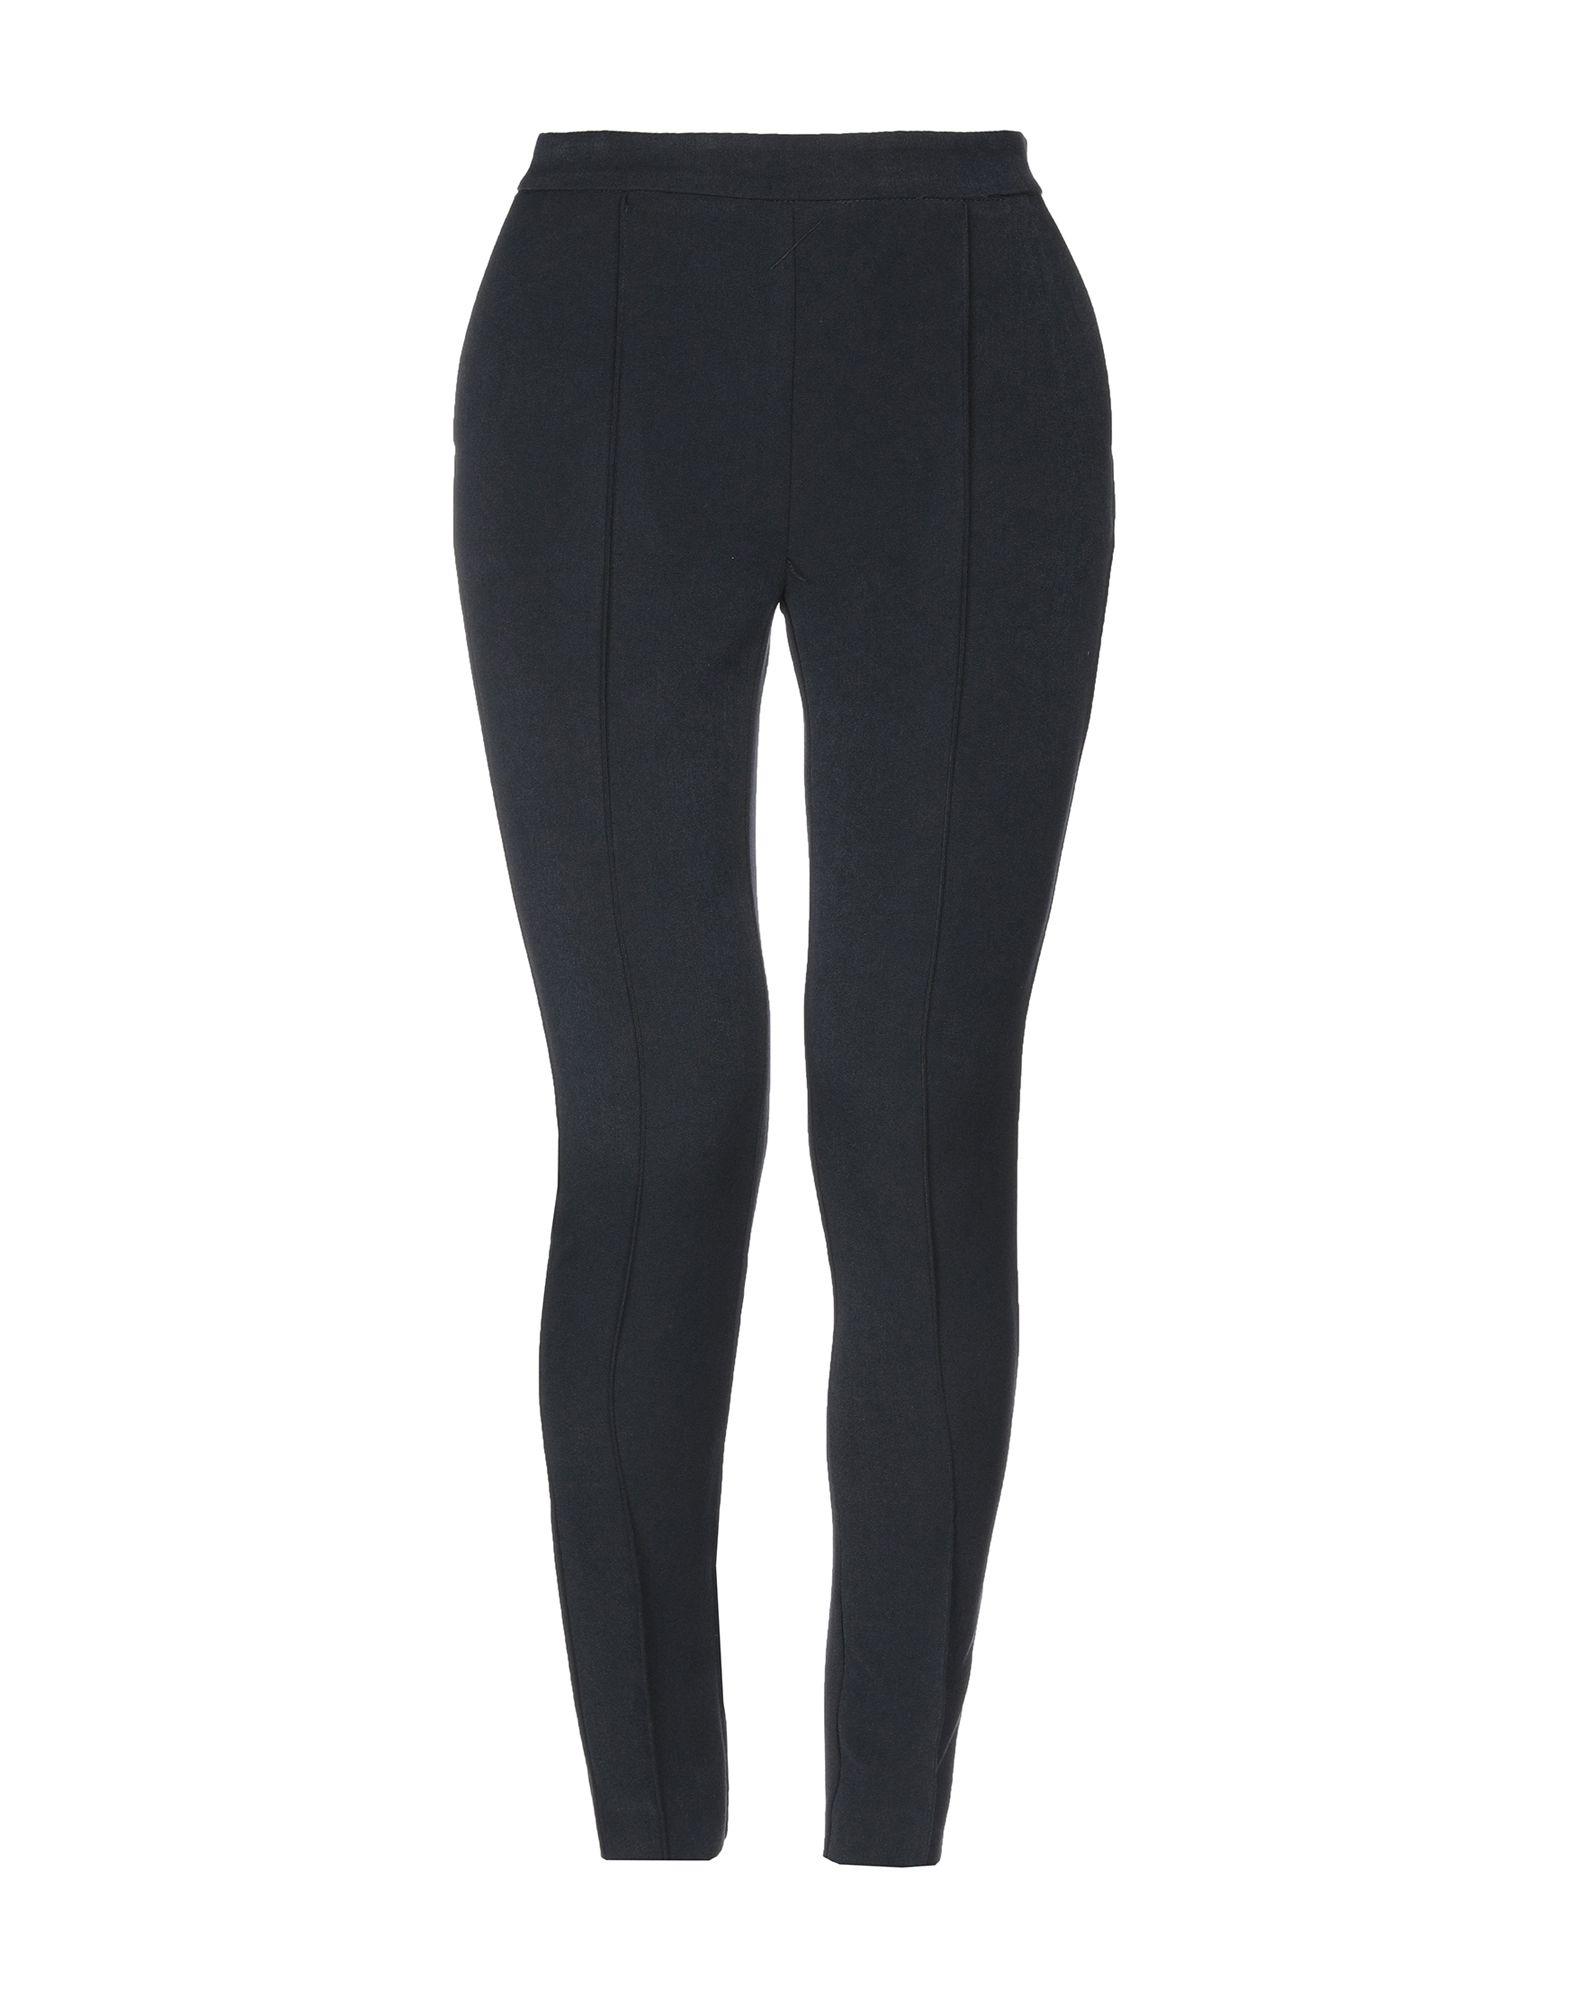 Pantalone Compagnia Italiana Italiana donna - 13238592RF  Sparen Sie 50% -75%!